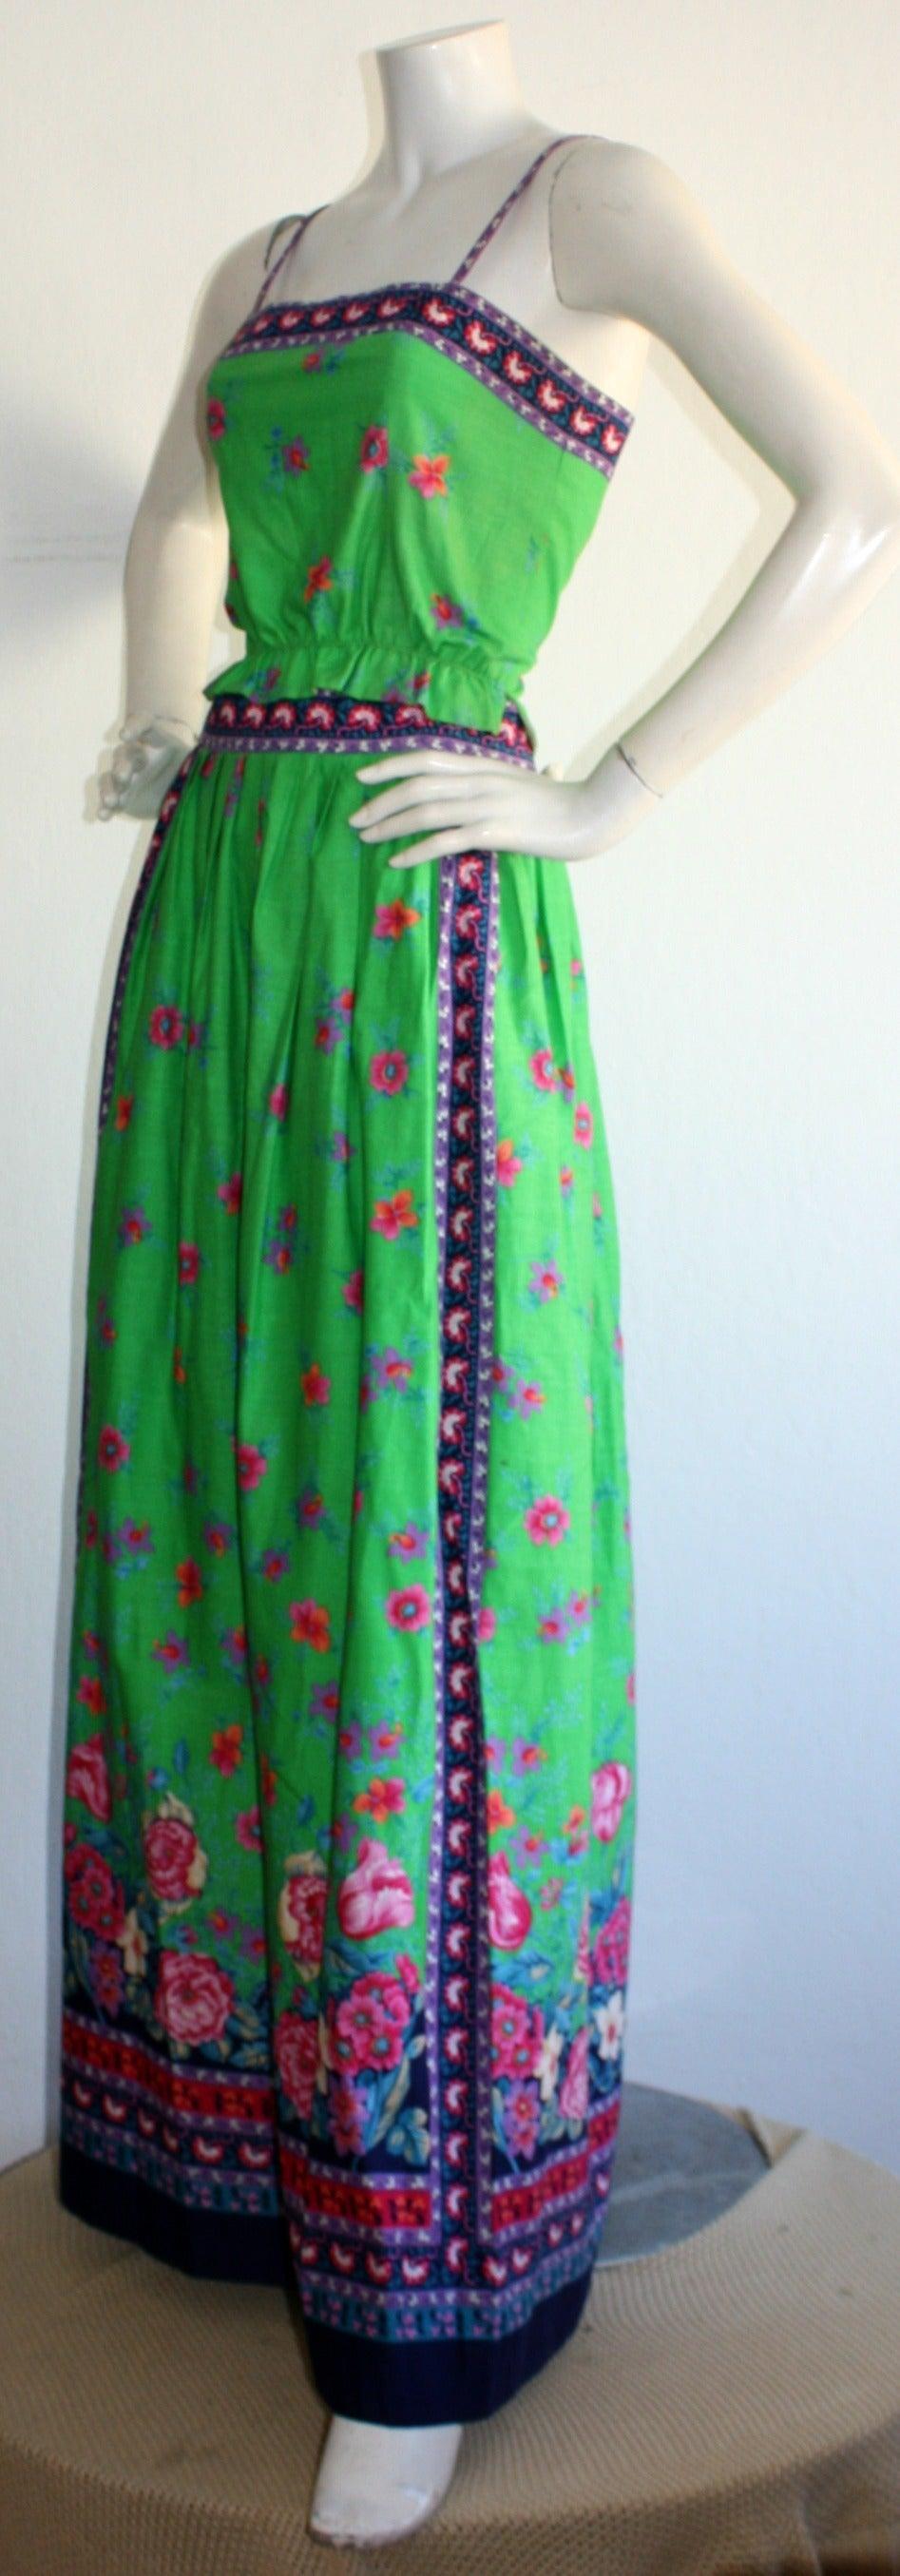 Women's 1960s Vintage Tina Leser Green Floral Print 2 - Piece Dress Ensemble For Sale